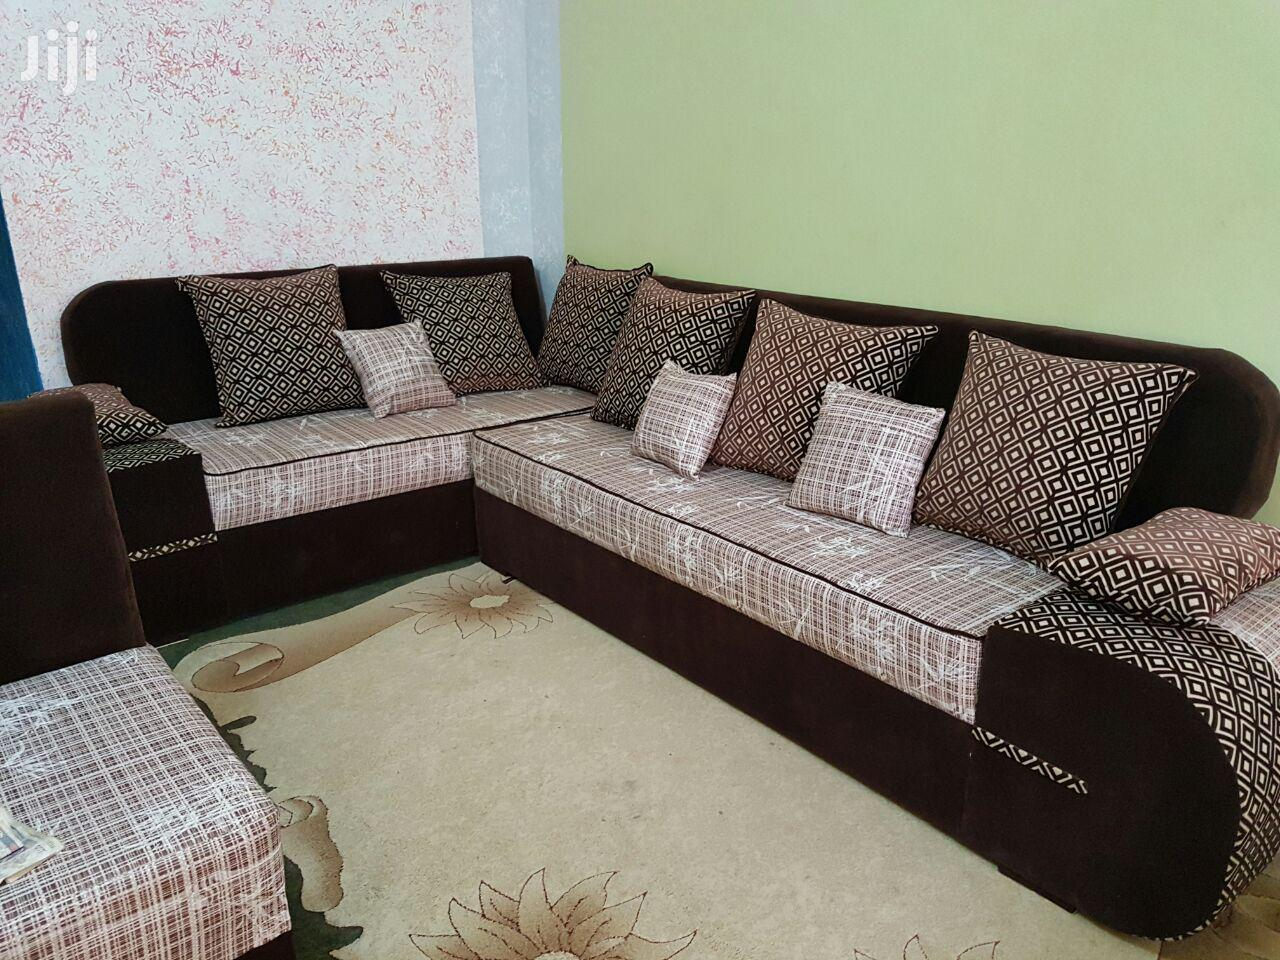 Sofa Sets and Majlis New Designs   Furniture for sale in Nyali, Mombasa, Kenya